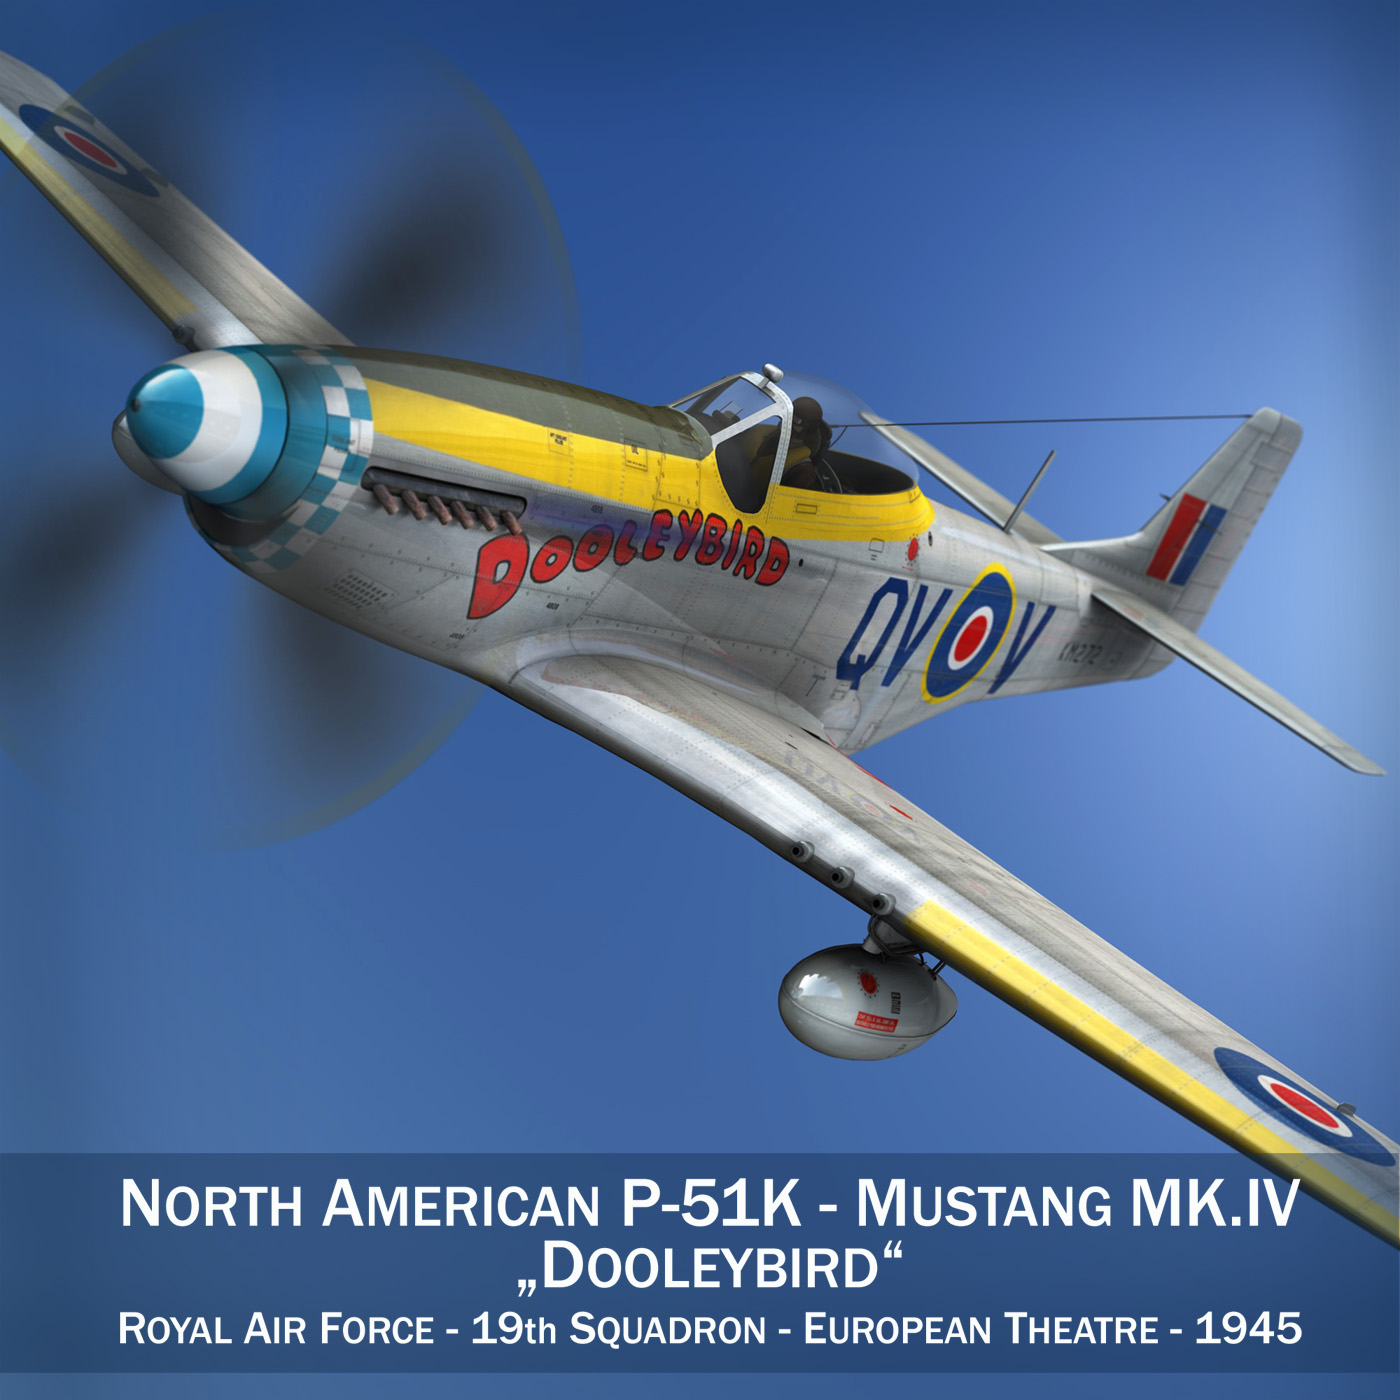 north american p-51k mustang mk.iv – dooleybird 3d model fbx lwo lw lws obj c4d 266716